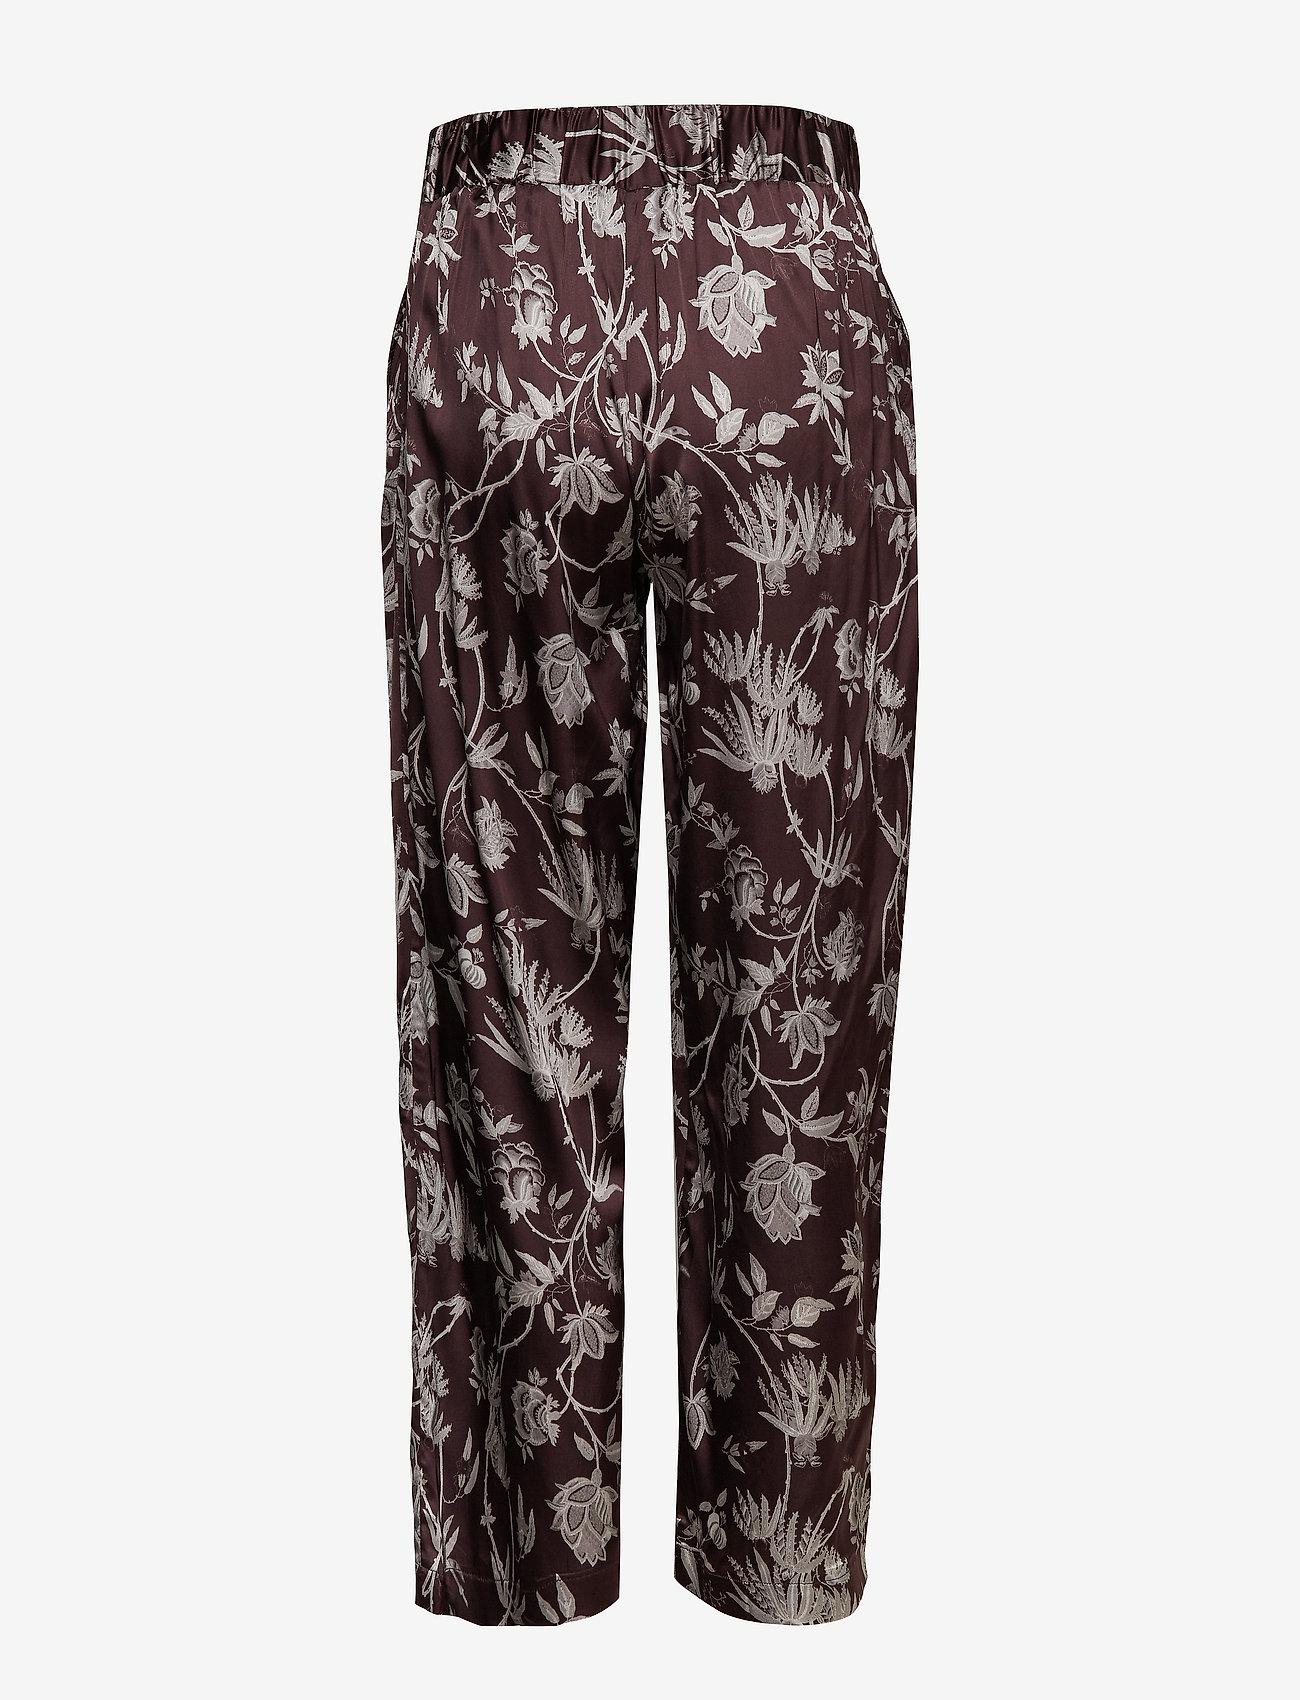 Lila Mw Trousers (Chocolate Plum) - Second Female Kn3DjY